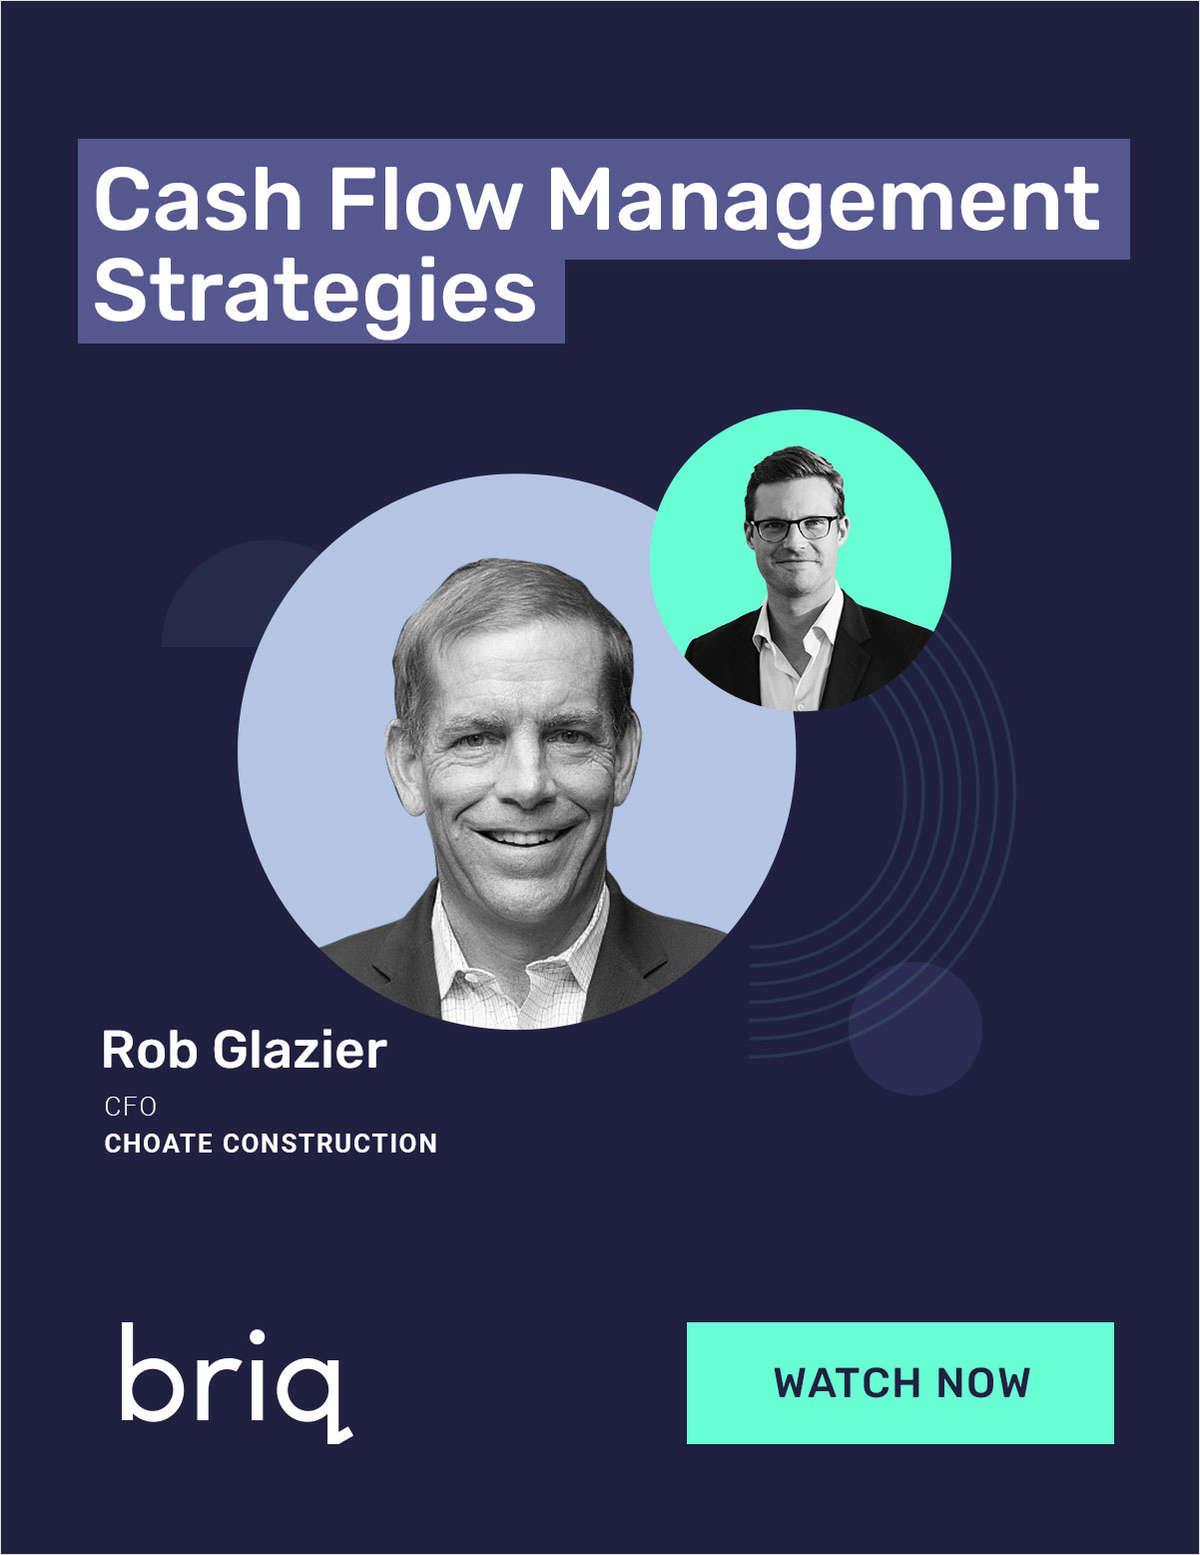 Cash Flow Management Best Strategies